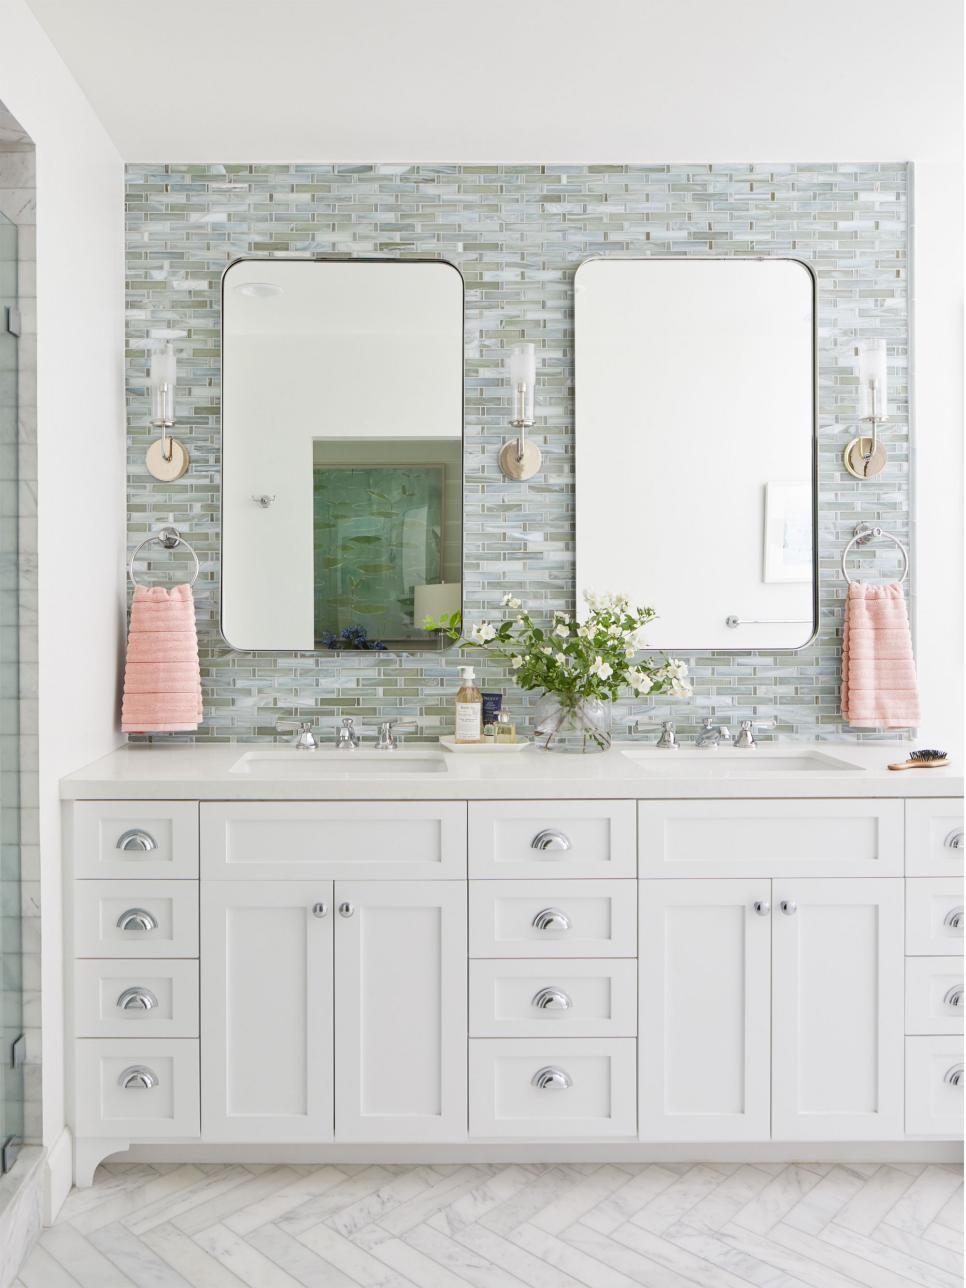 40 Chic Bathroom Tile Ideas Bathroom Wall And Floor Tile Designs Hgtv Bathroom Tile Designs Tile Bathroom Bathroom Wall Tile